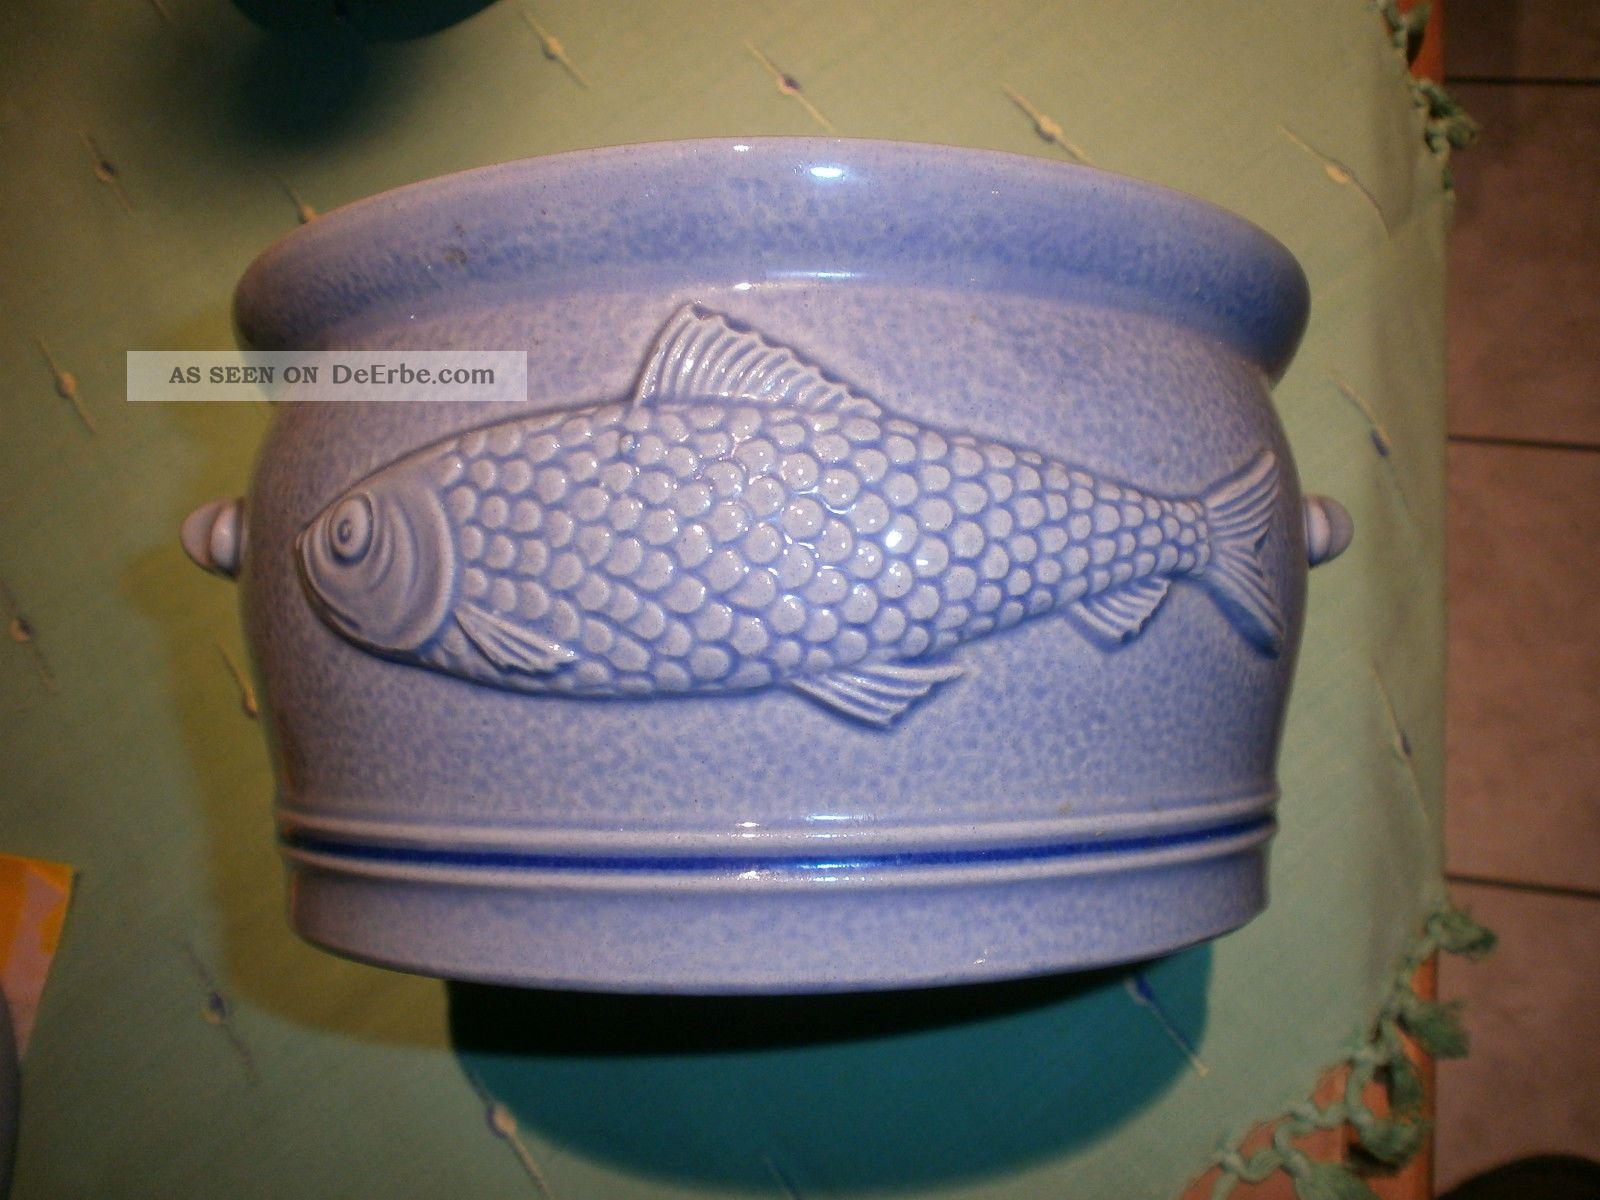 Fischtopf Aus Keramik Haushalt Bild